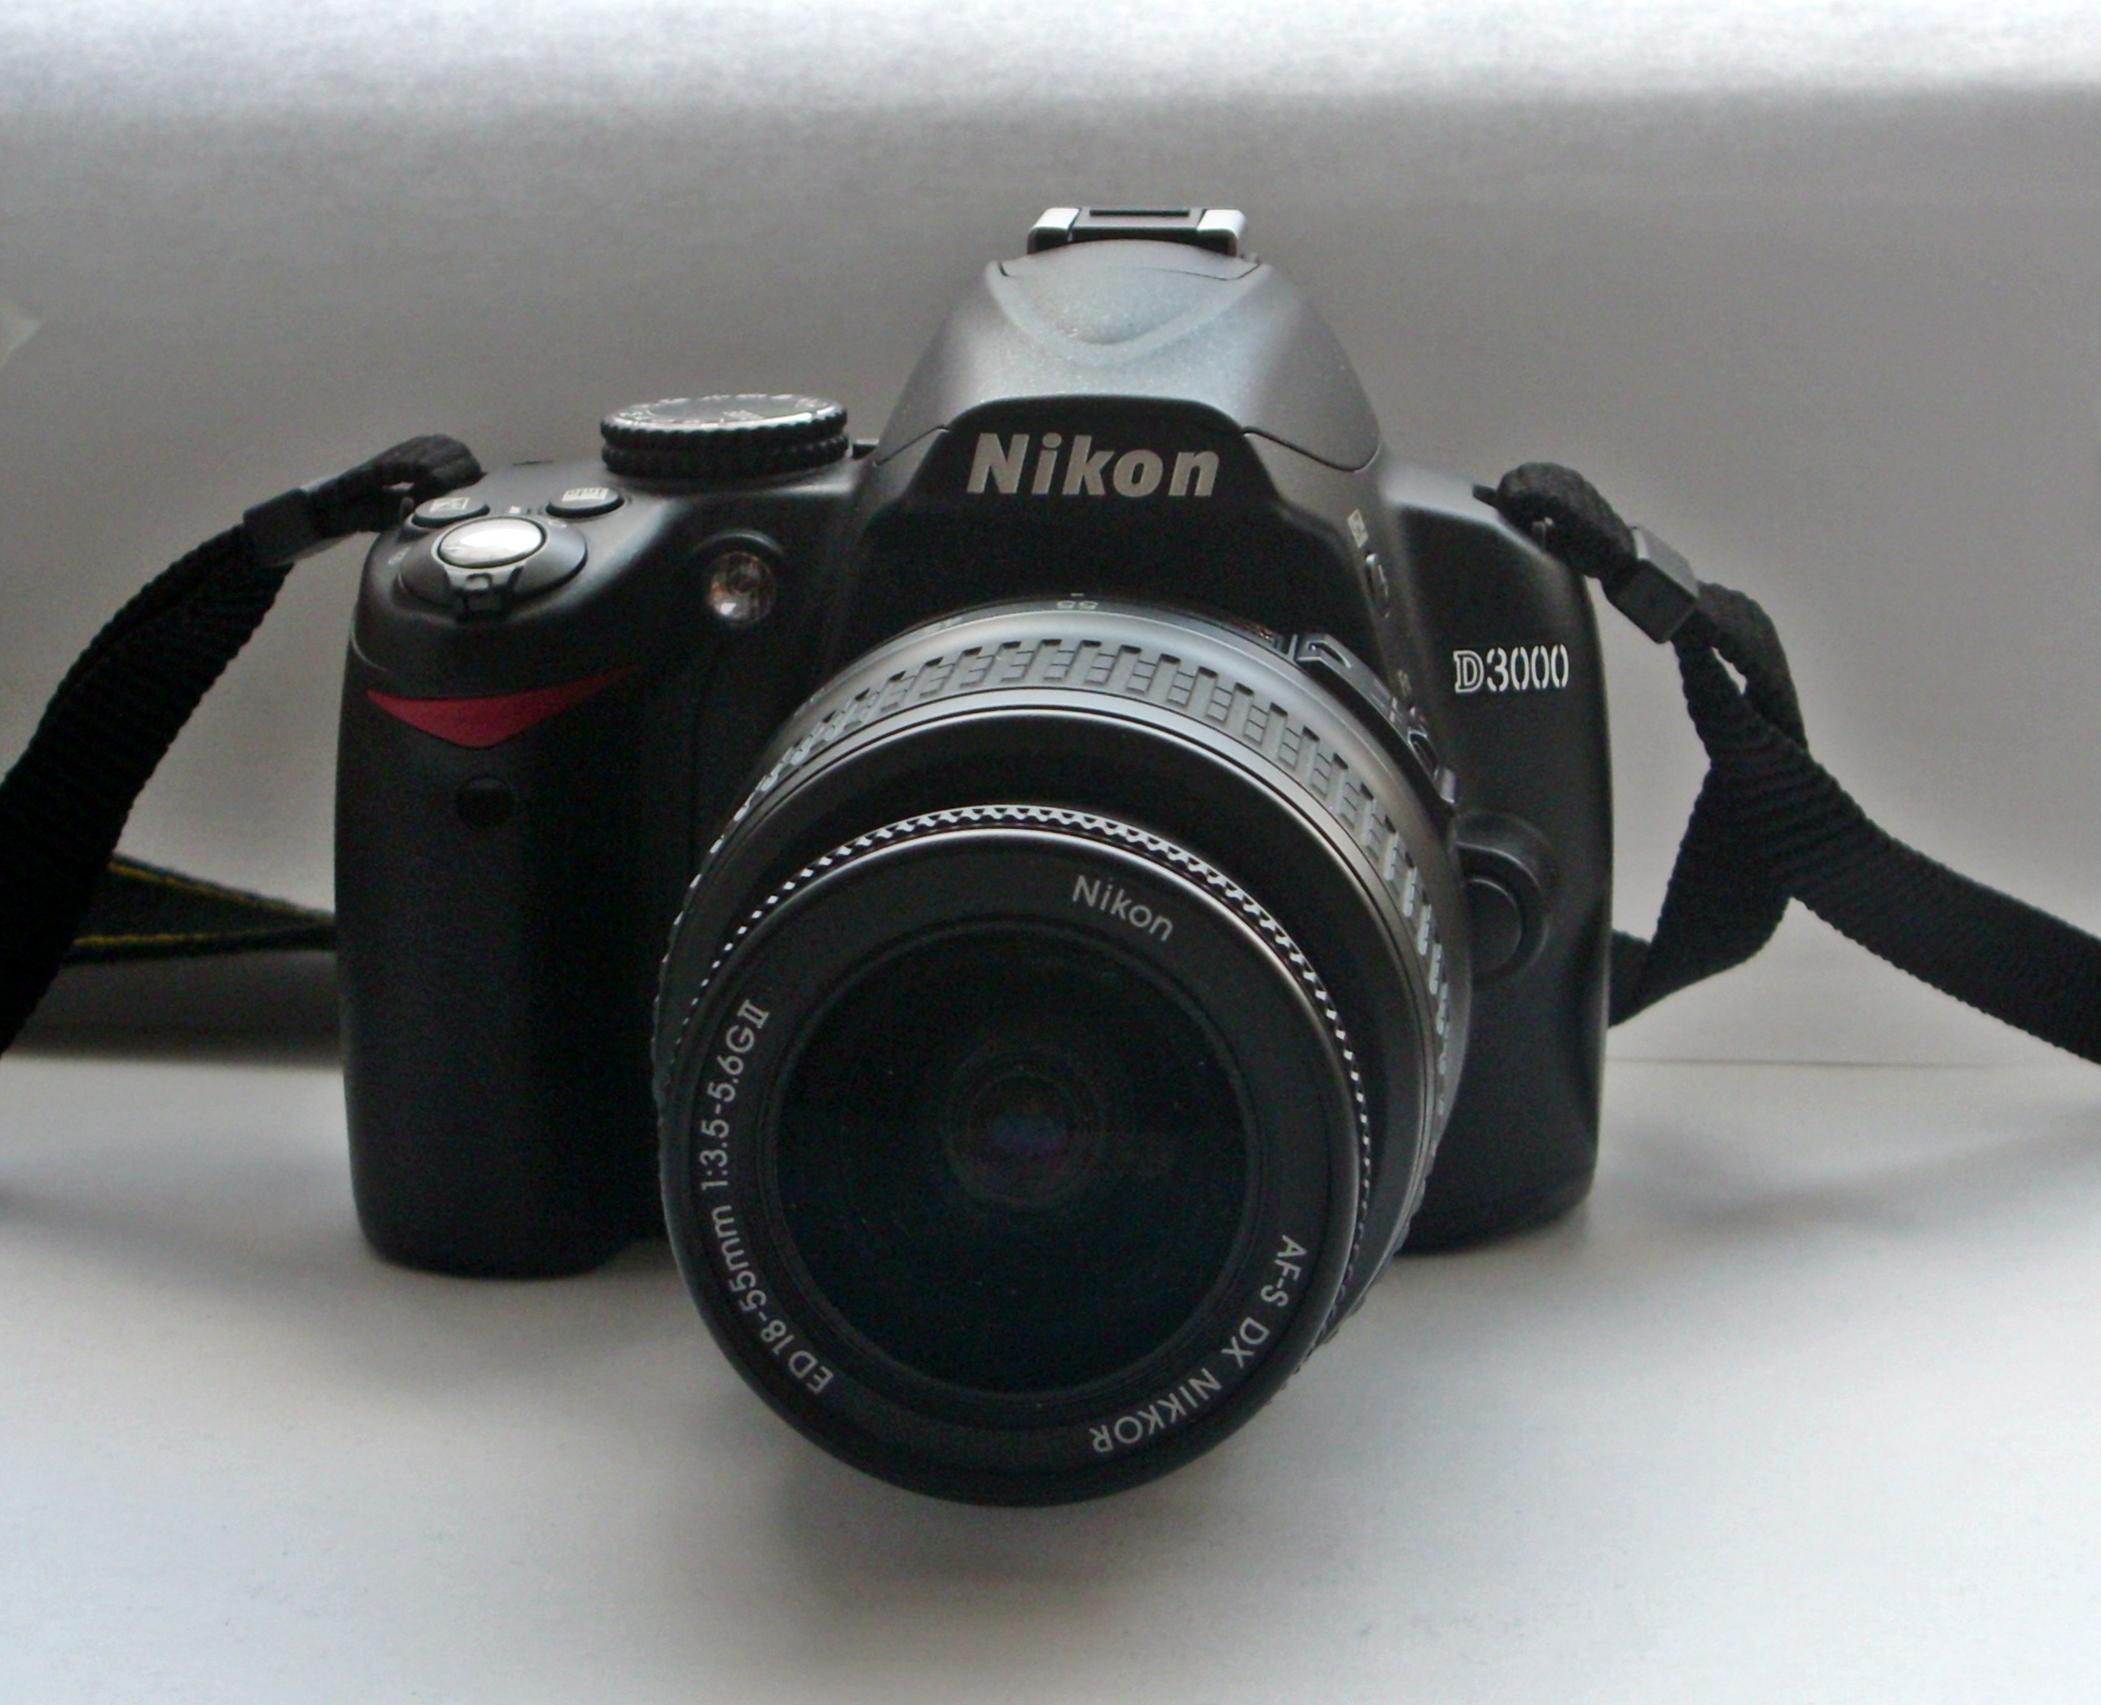 Zoom Nikon D3000 Nikon D3000 With Lens 18-55mm